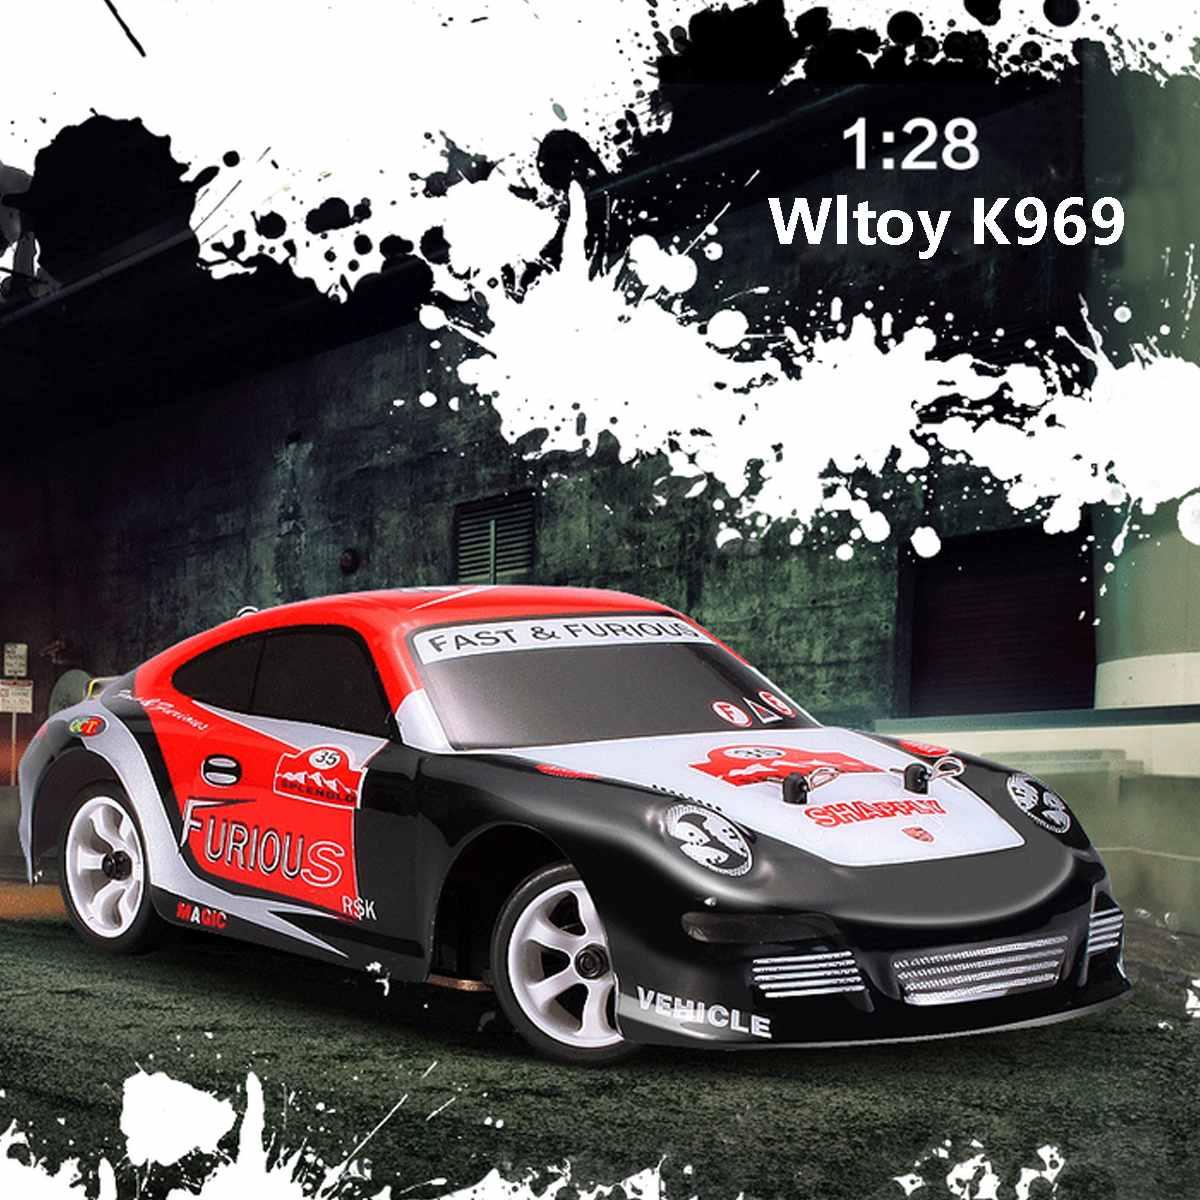 1/28 30km/h High Speed Drift Toy Racing Car K969 Brushed RC Car 130 Brush Motor Drive Shockproof Ground Vehicle For Boys Kids1/28 30km/h High Speed Drift Toy Racing Car K969 Brushed RC Car 130 Brush Motor Drive Shockproof Ground Vehicle For Boys Kids